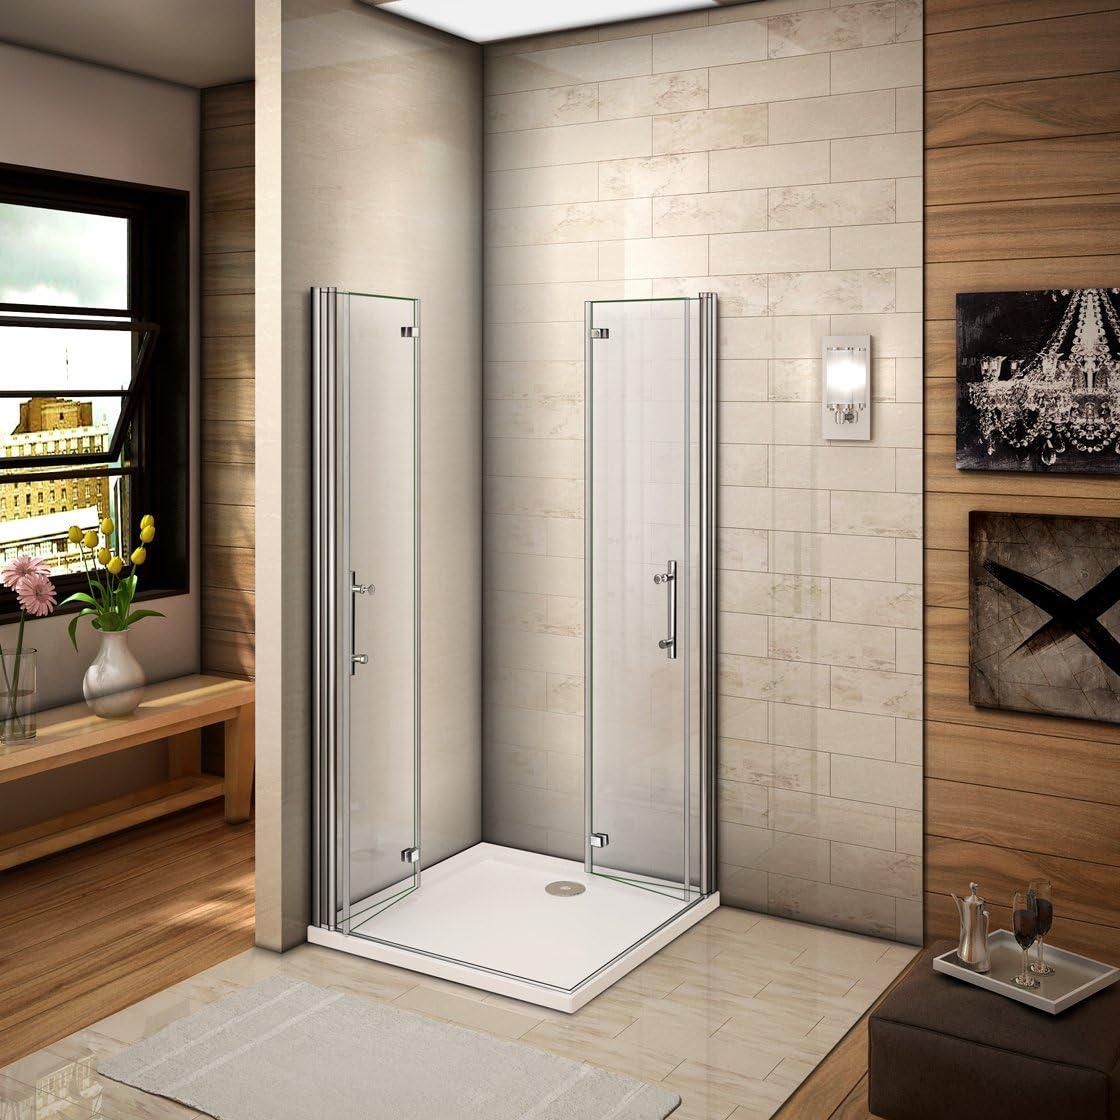 100 X 70 X 185 cm cabinas de ducha esquina ducha Mampara drehfalt ...